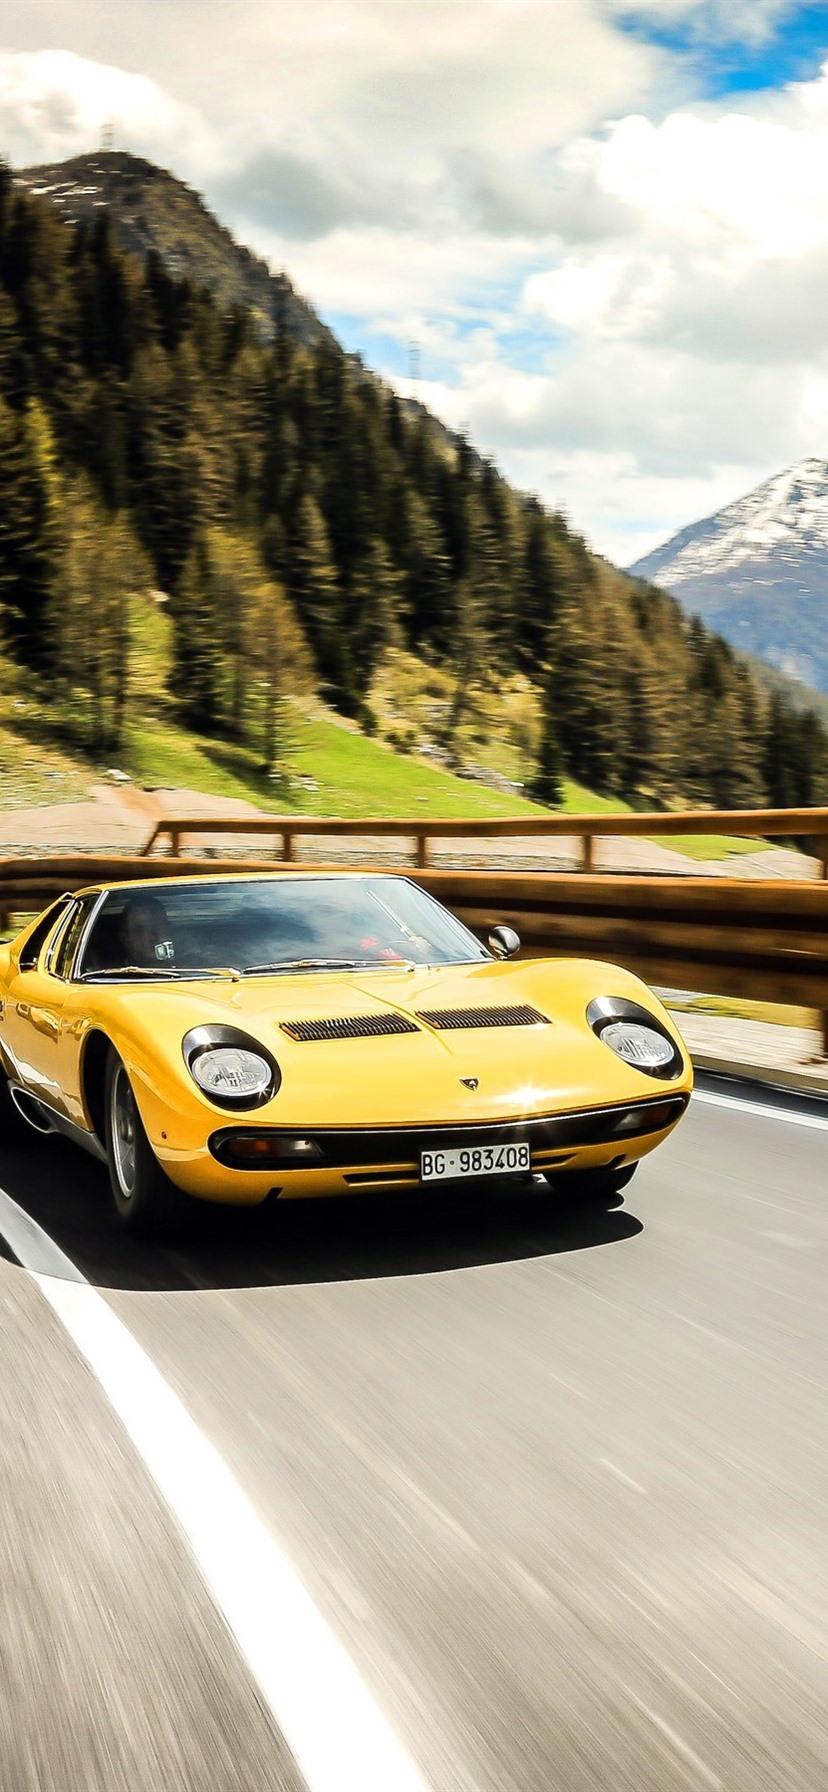 Lamborghini Lp700 4 And 1971 Yellow Supercars 828x1792 Iphone Xr